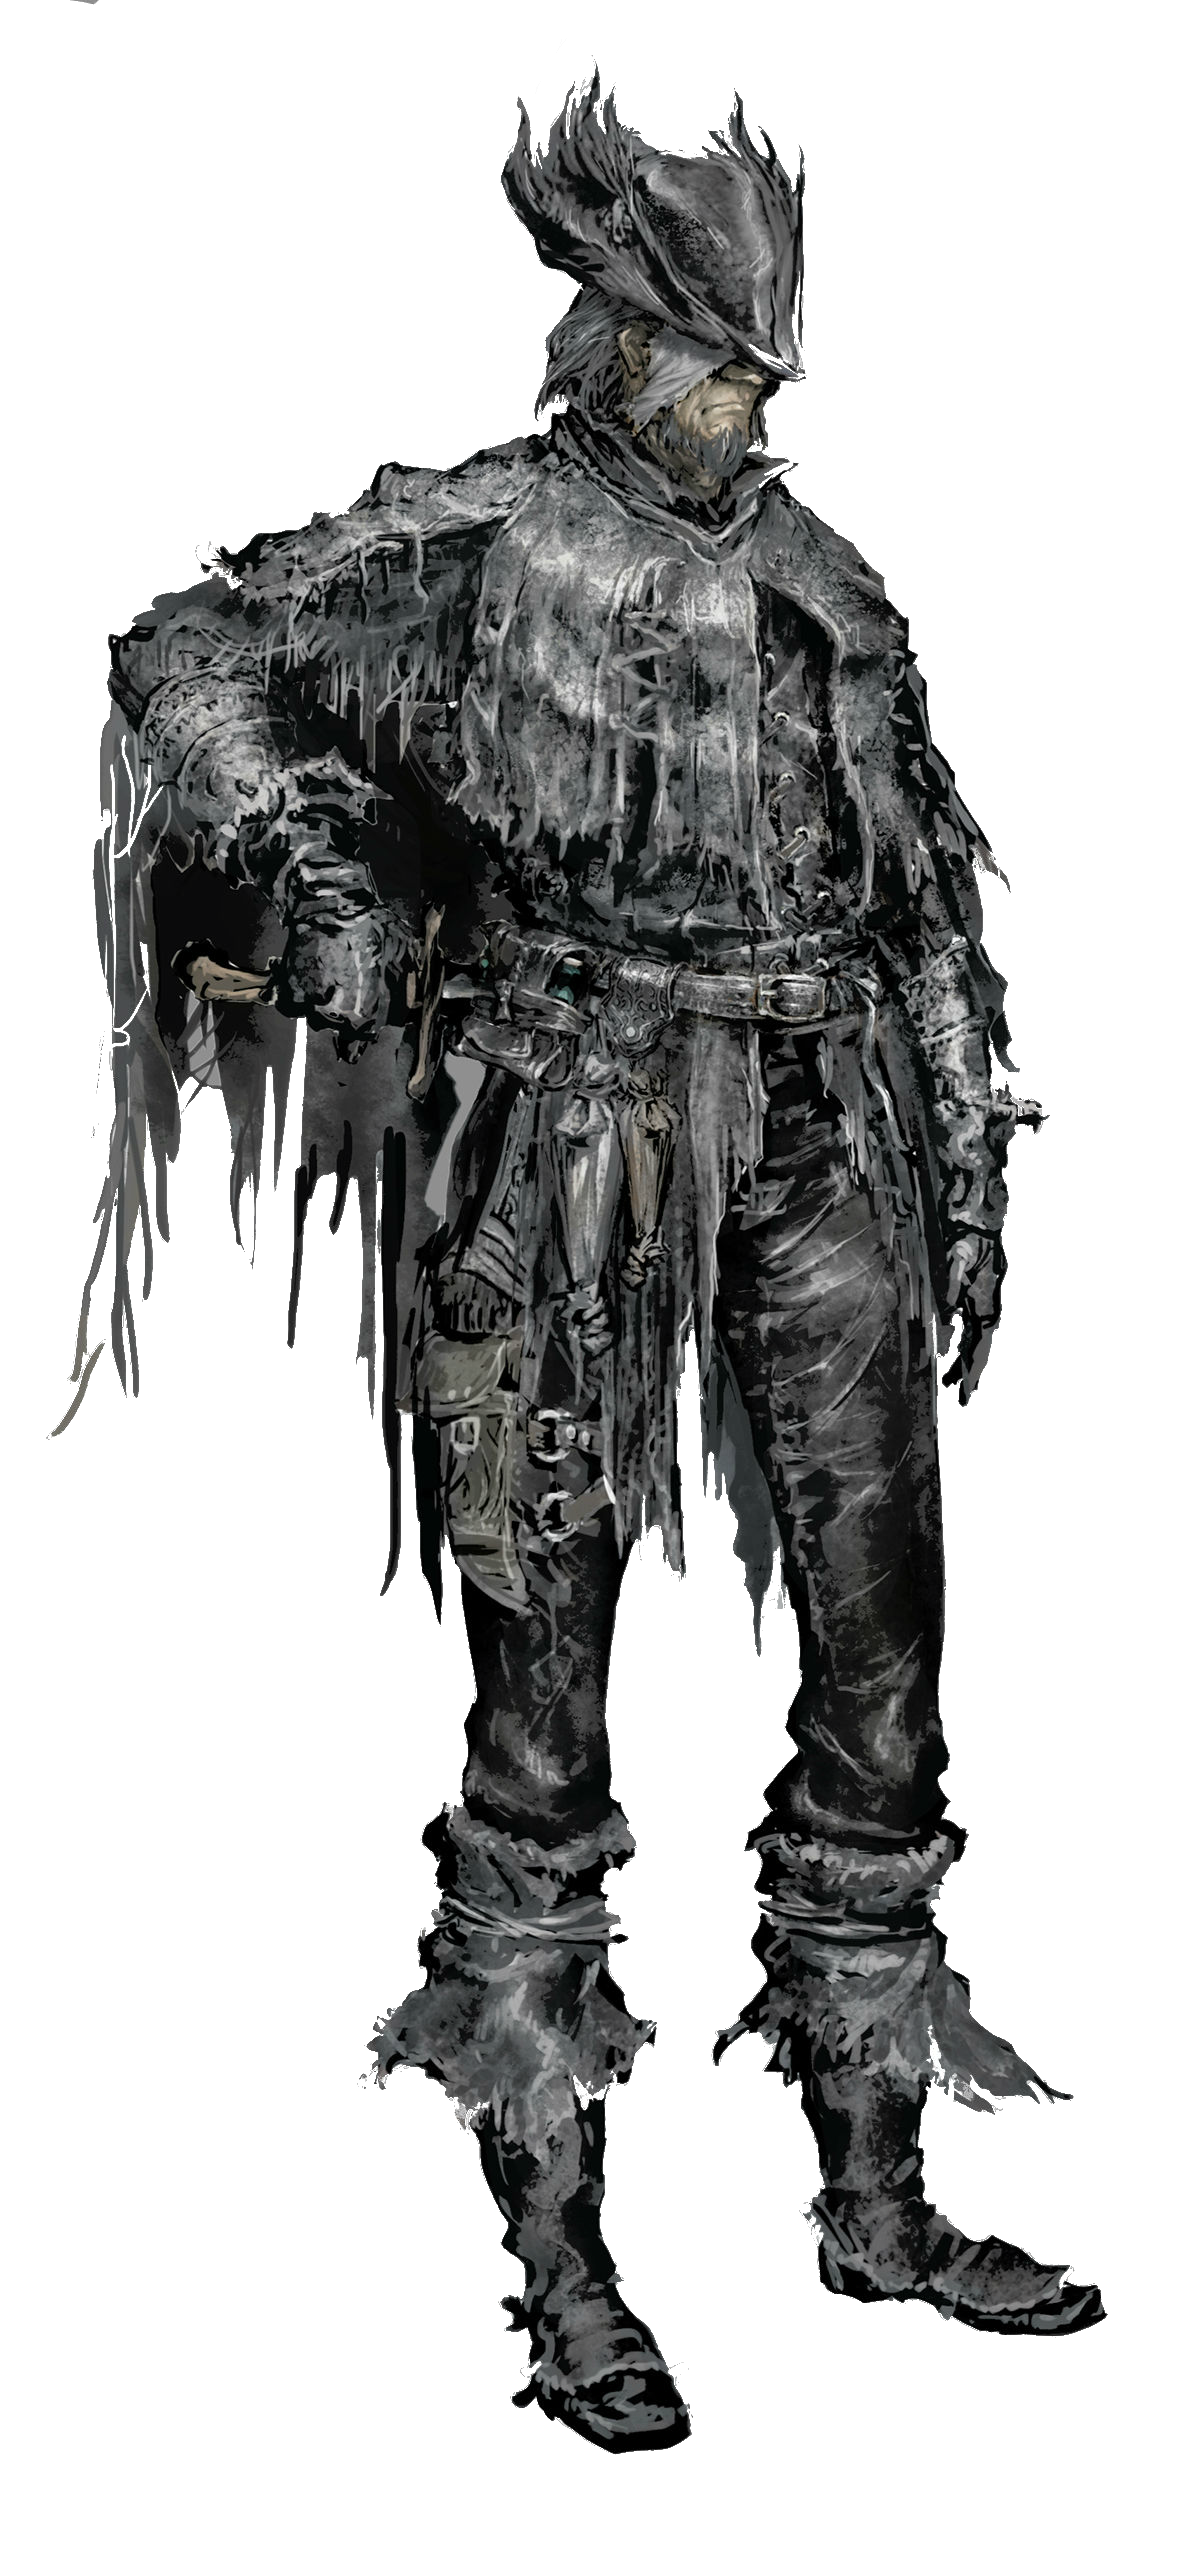 vector library stock Bloodborne drawing hunter. Retired djura vs battles